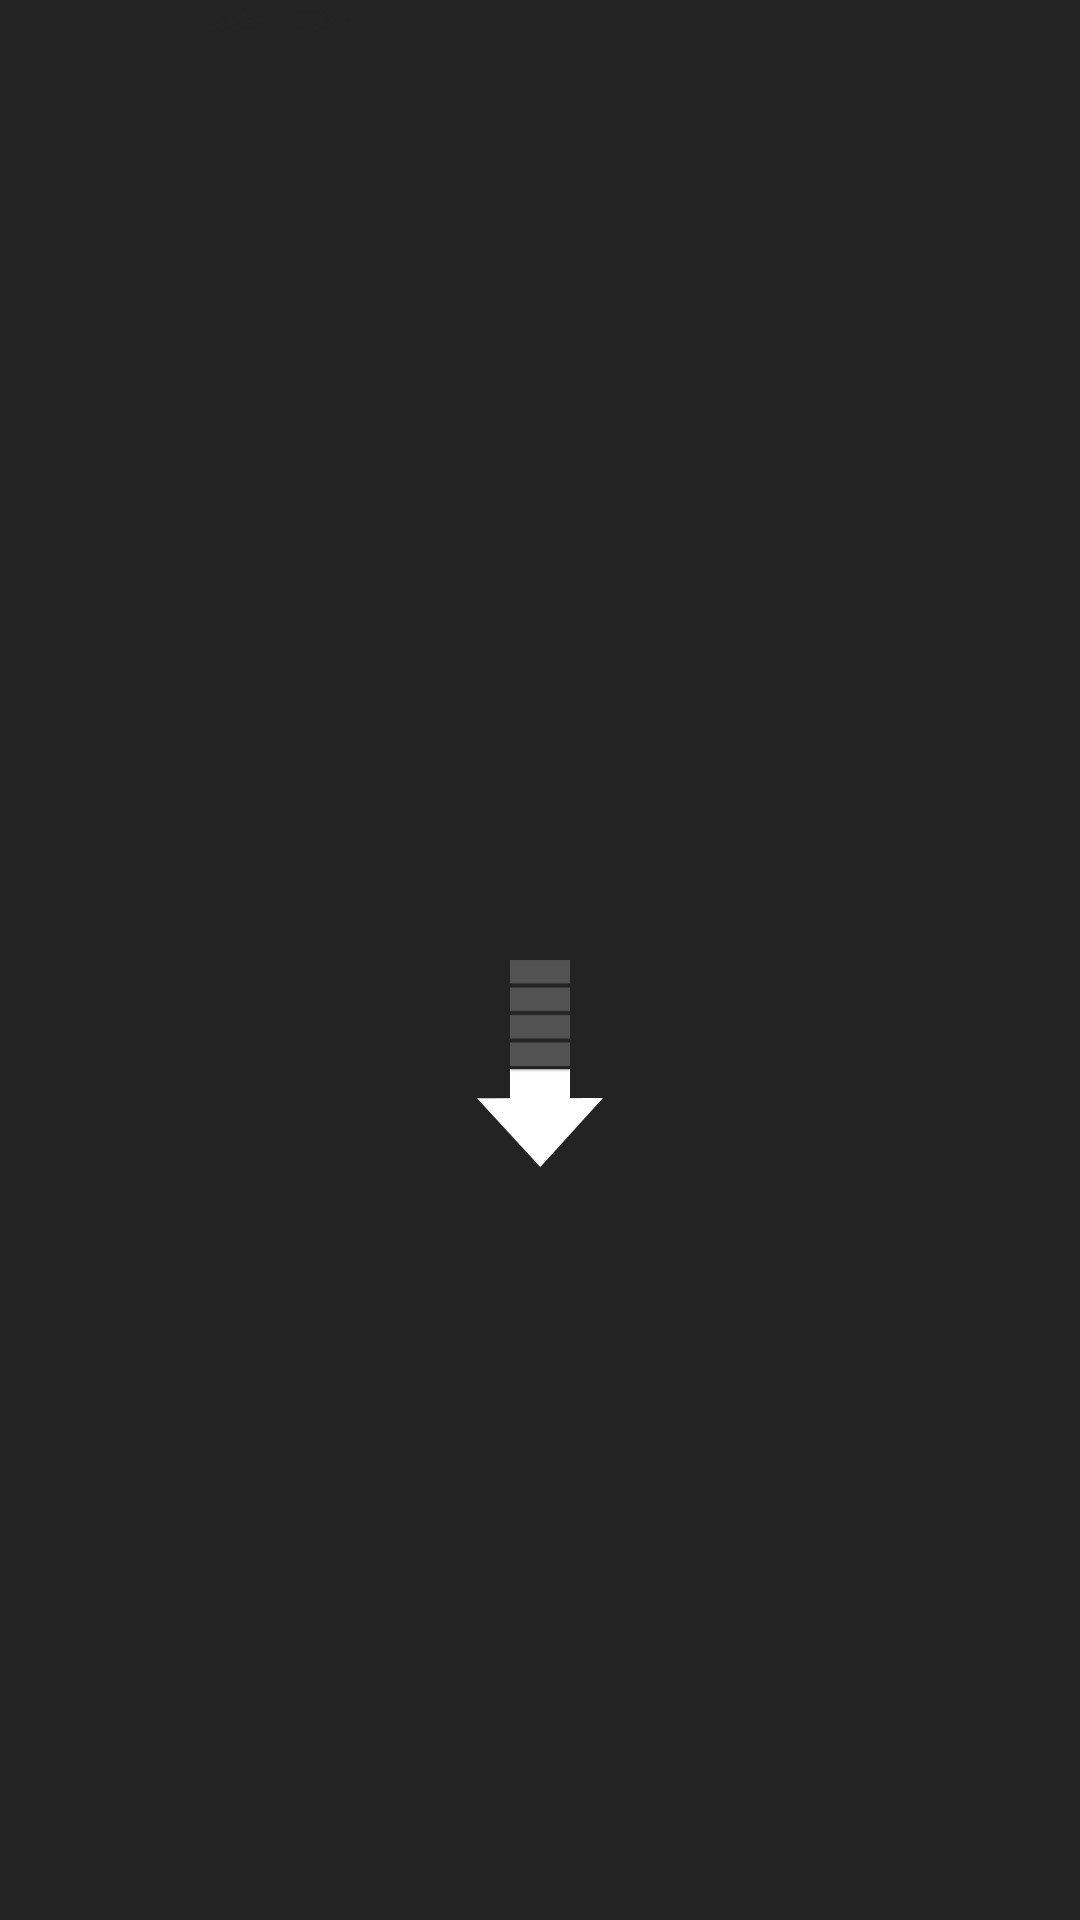 Gravity Falls Wallpaper 1366x768 Simple Background Digital Art Downloading Portrait